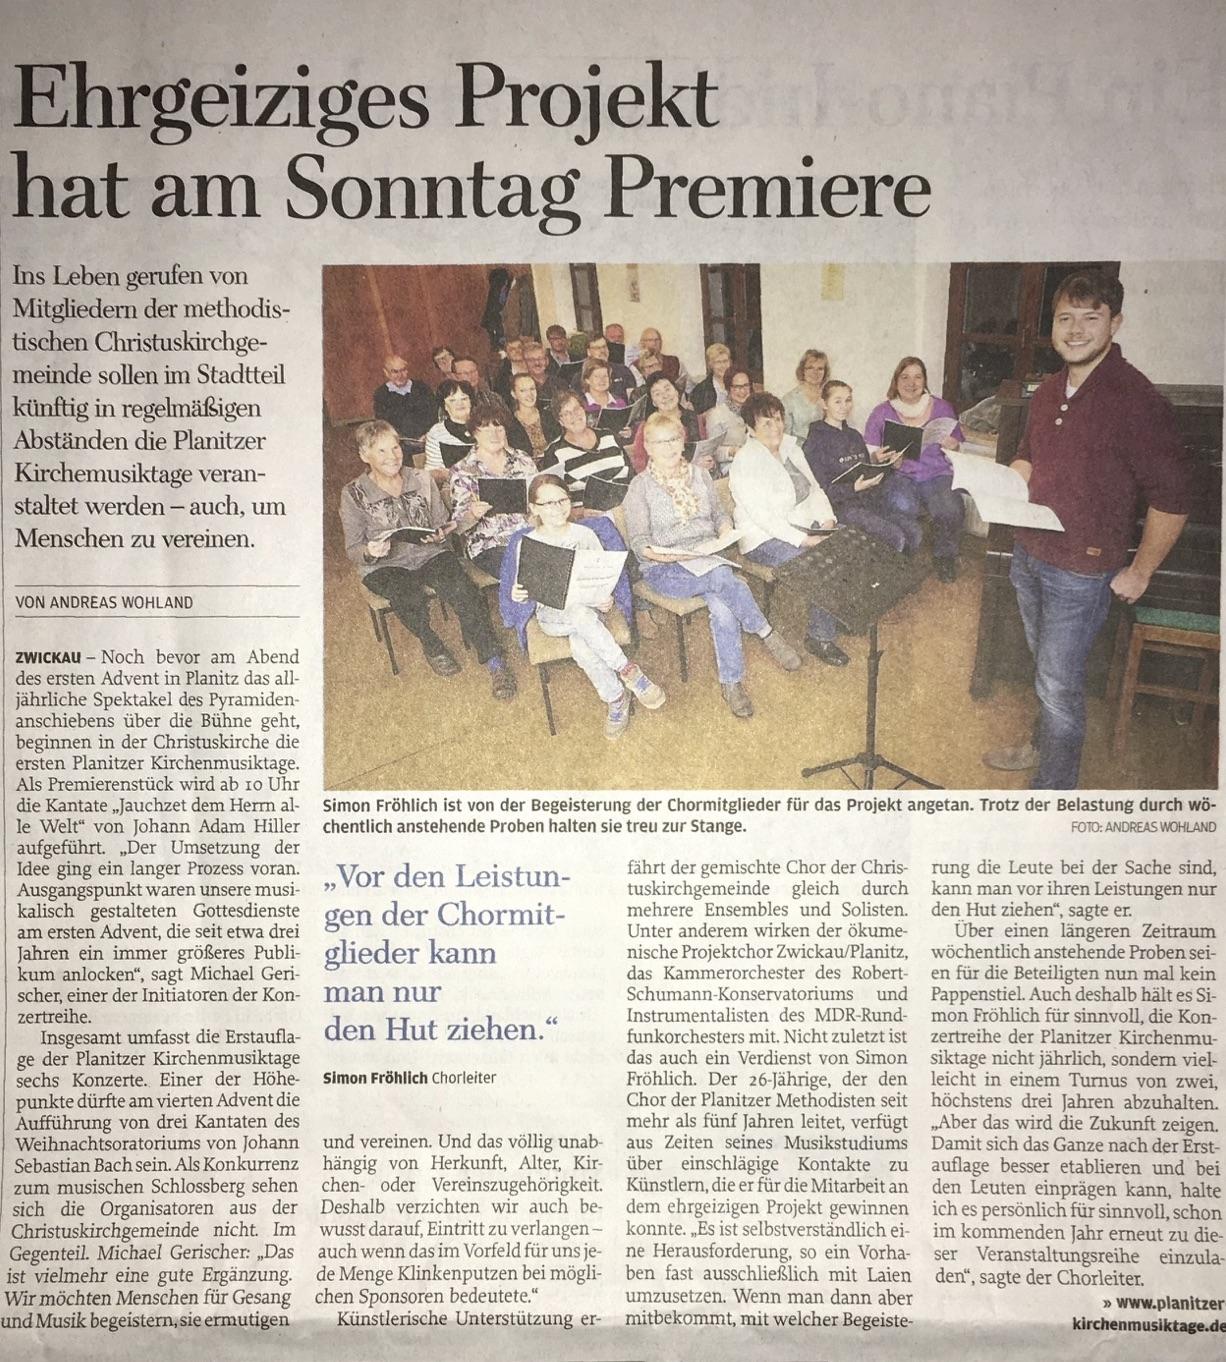 Freie Presse 24.11.16